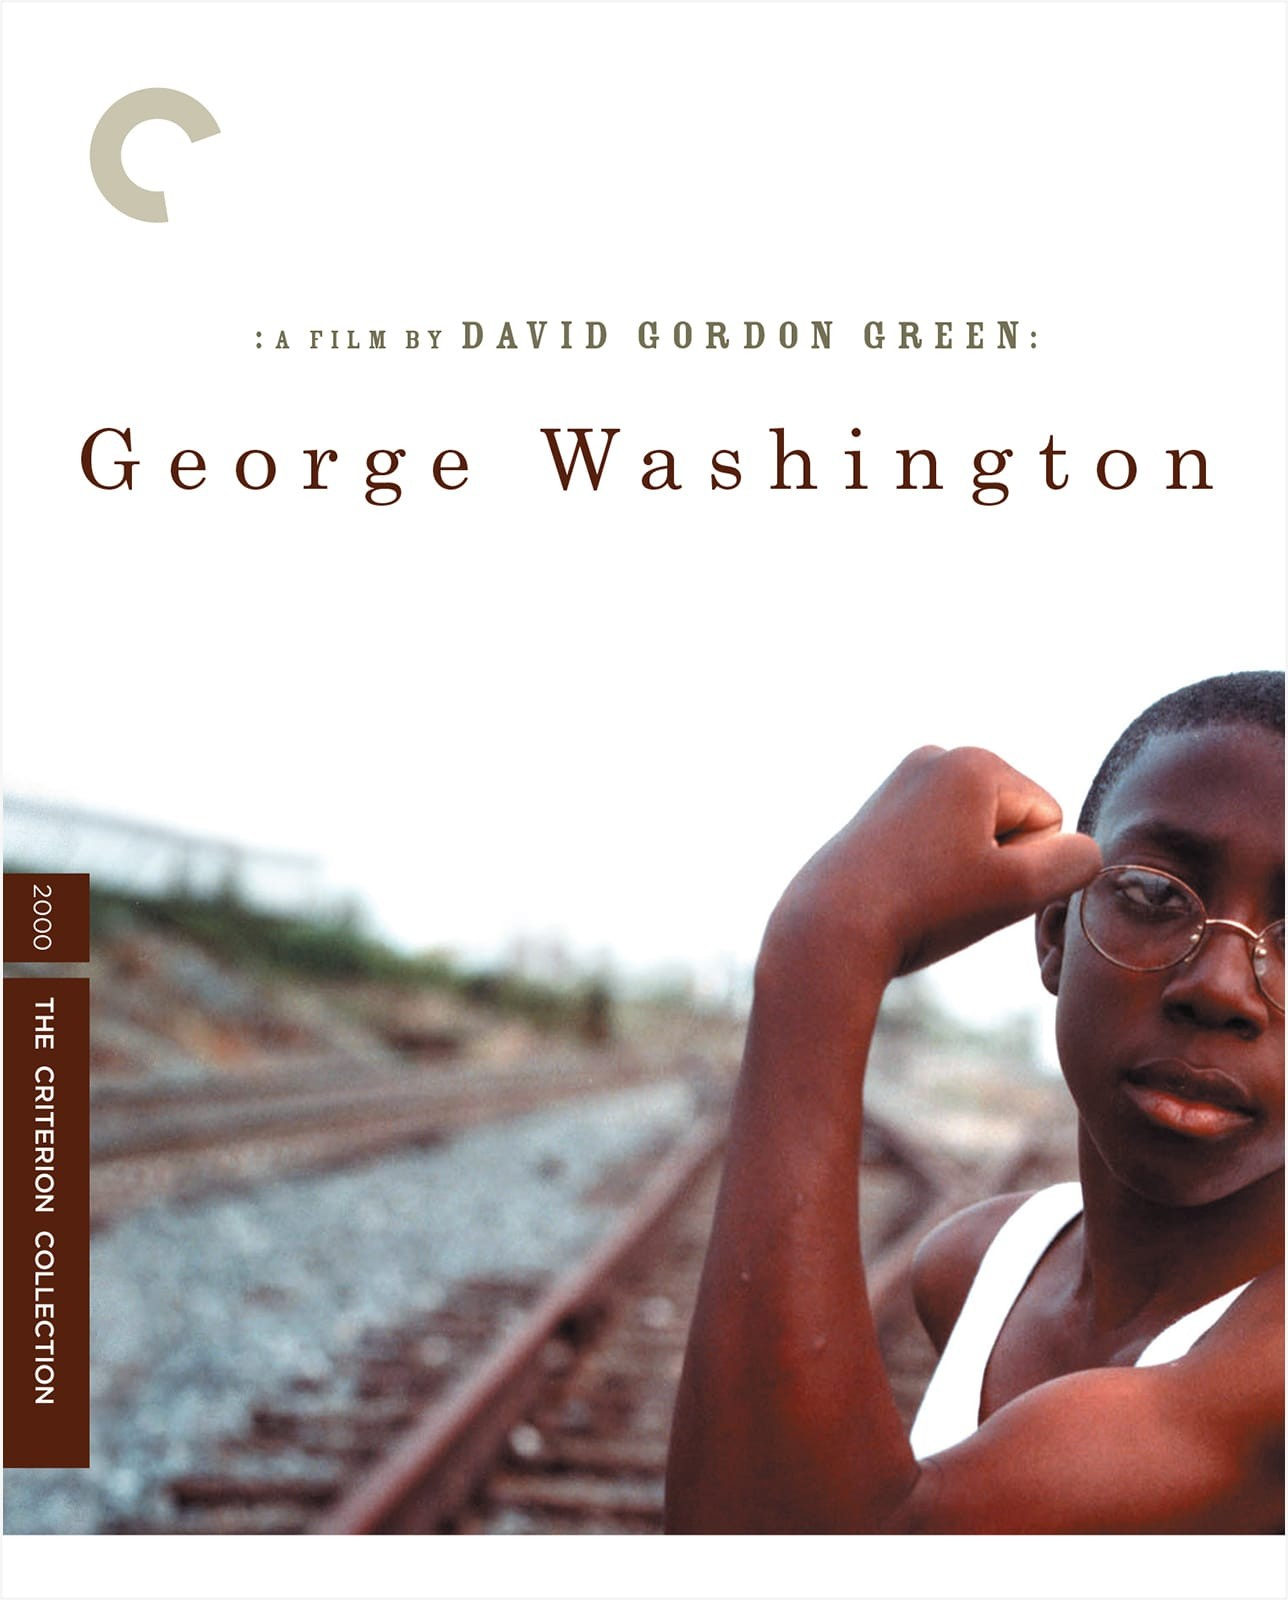 Blu-ray Review: George Washington - Slant Magazine